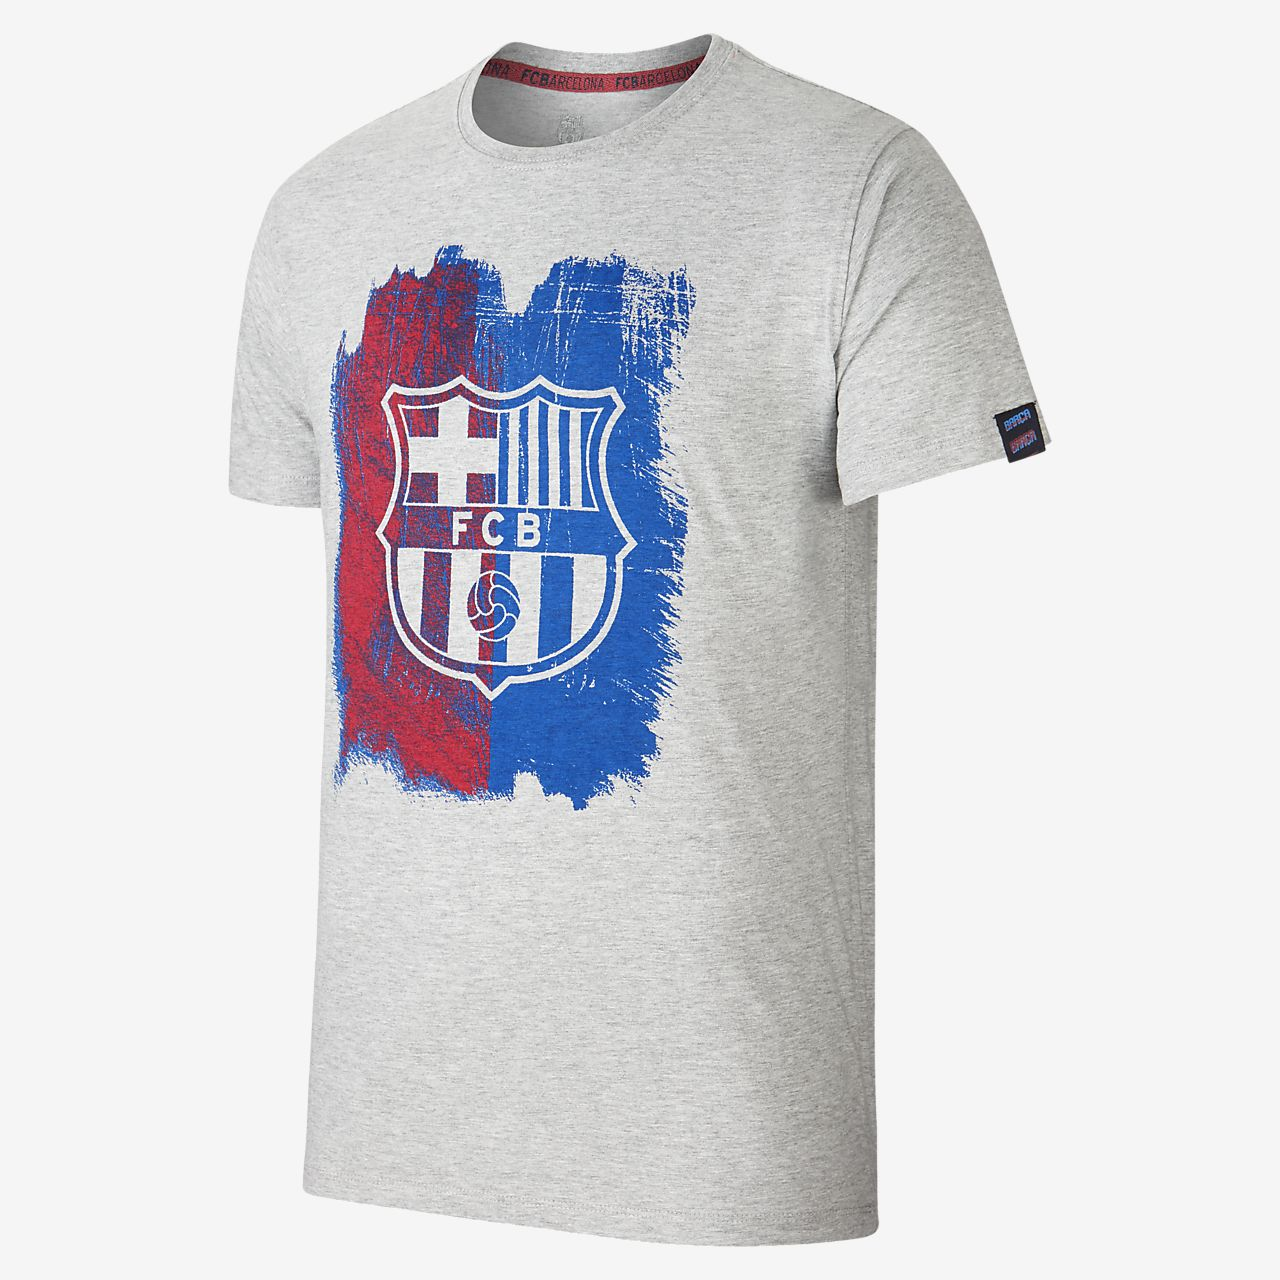 80ab0021760 FC Barcelona Painted Men s T-Shirt. Nike.com GB